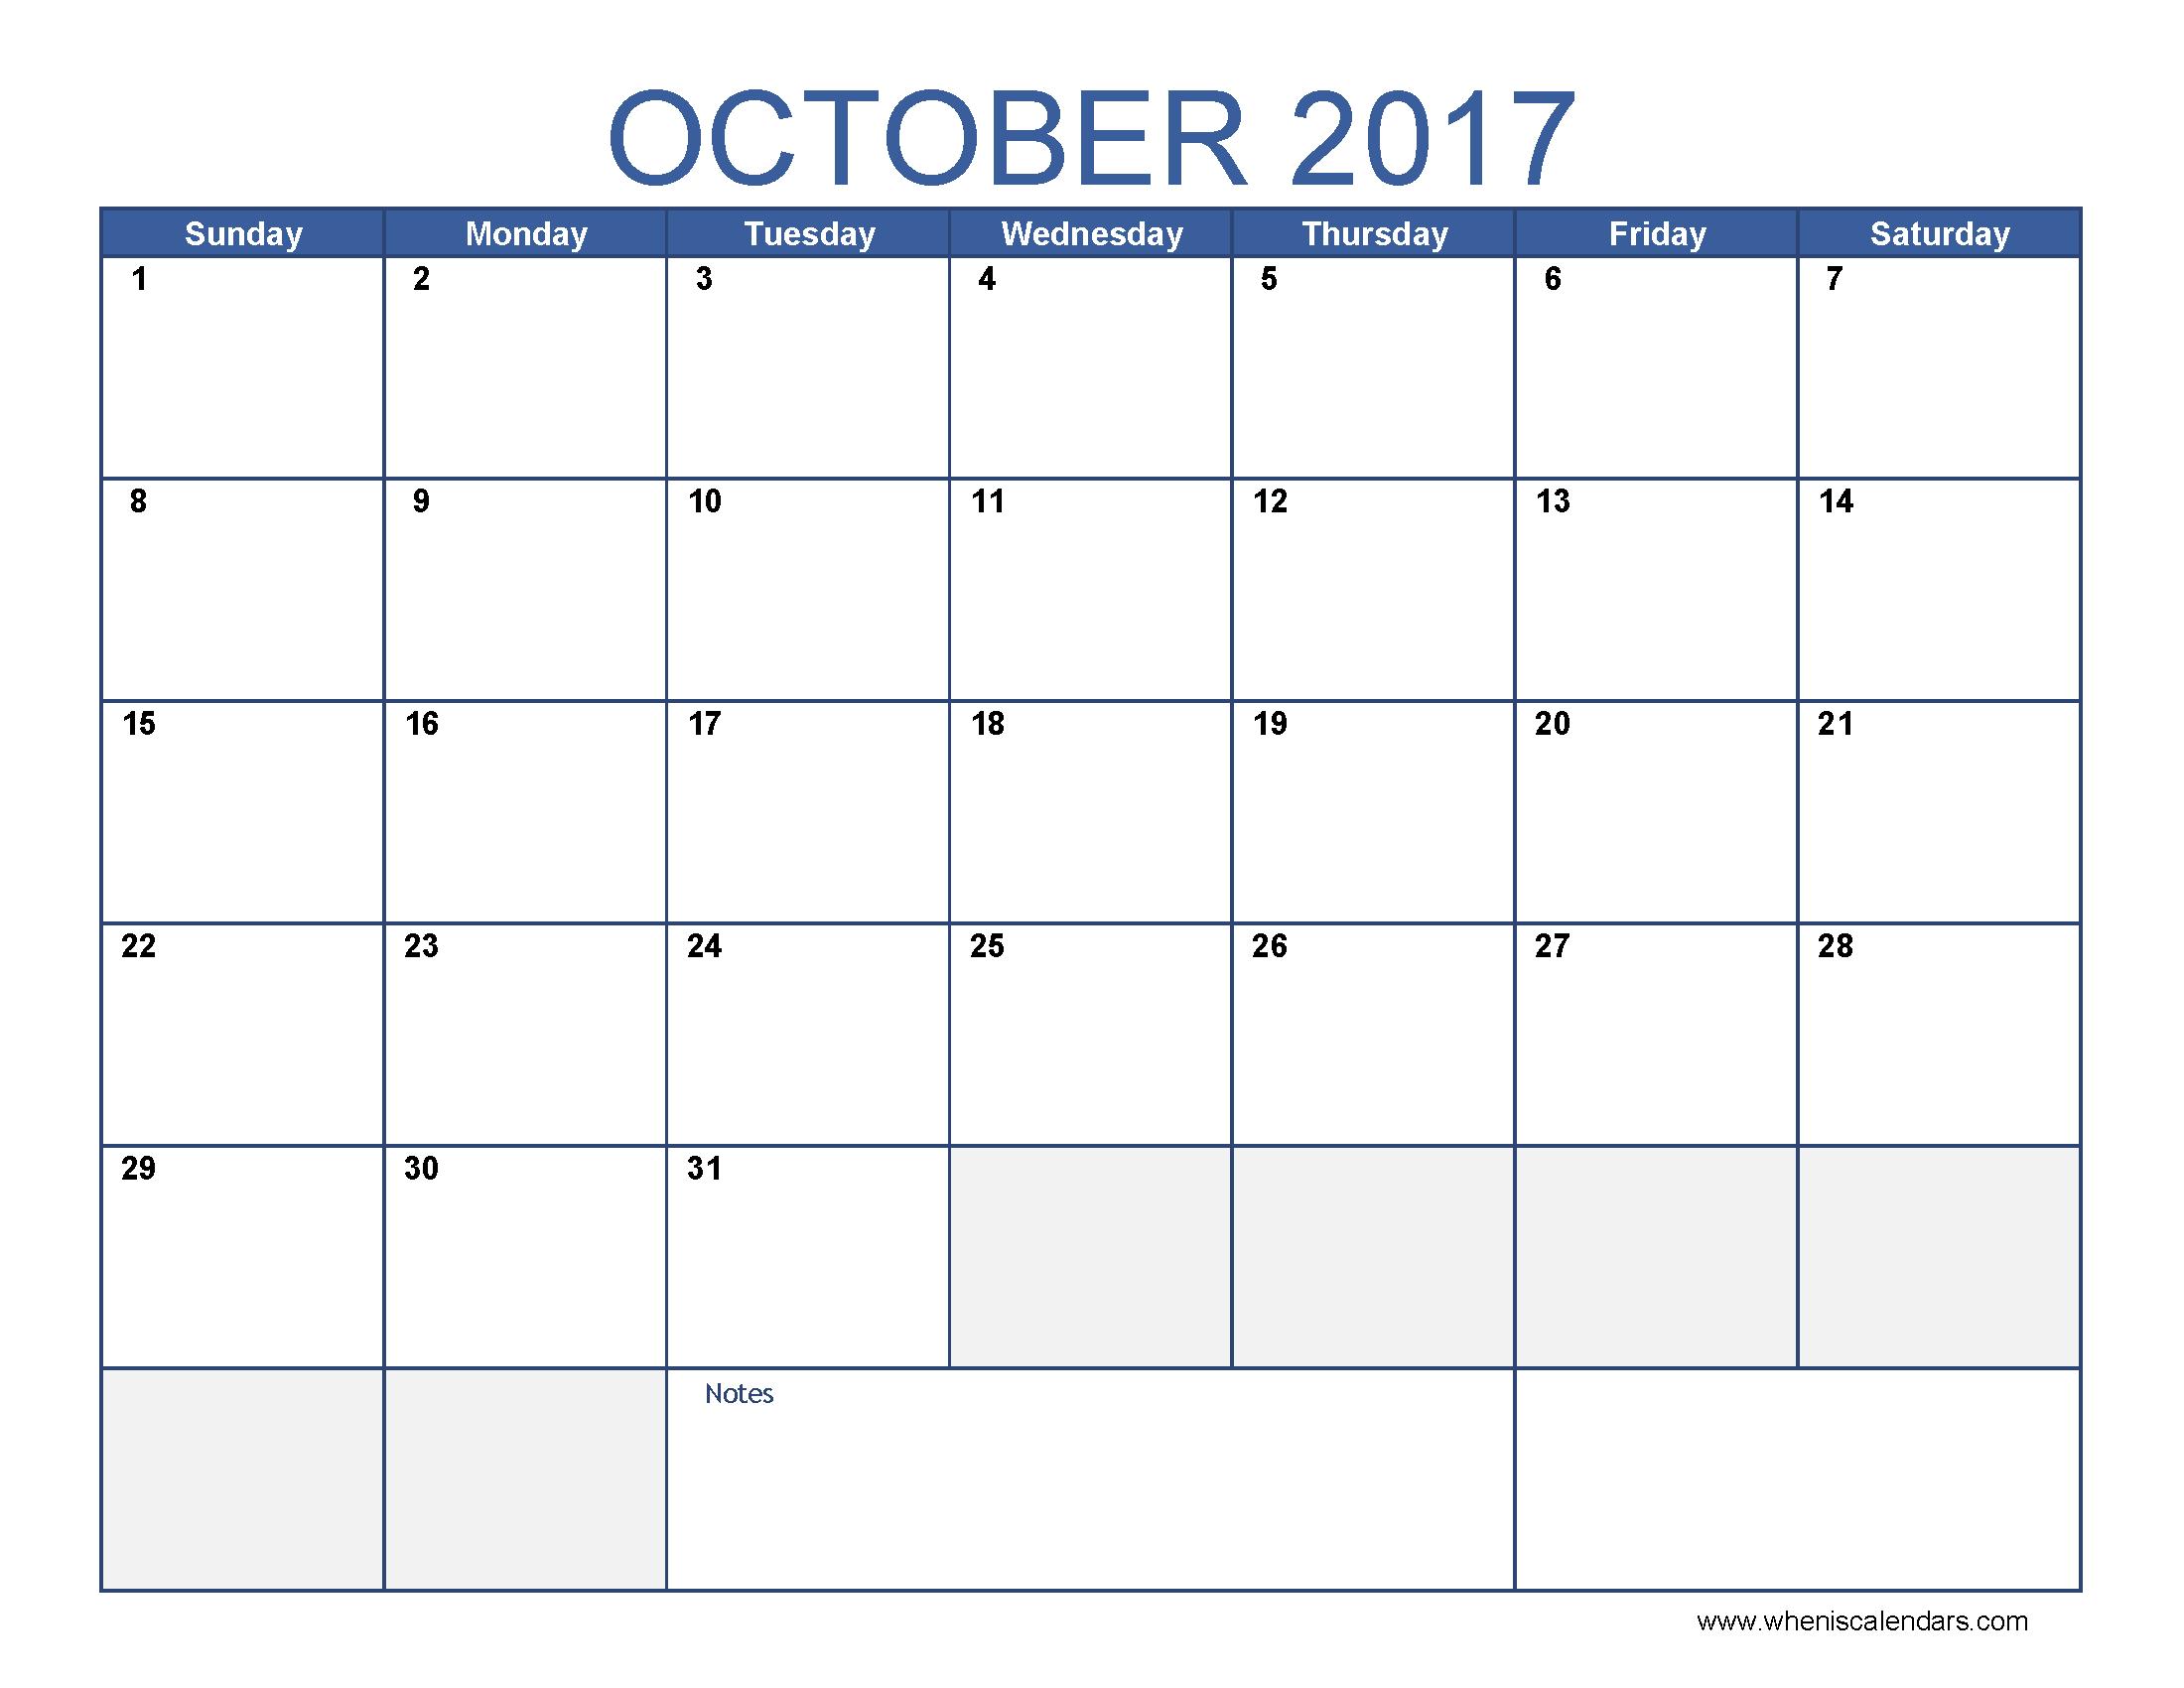 October 2017 Calendar Template | free calendar 2017